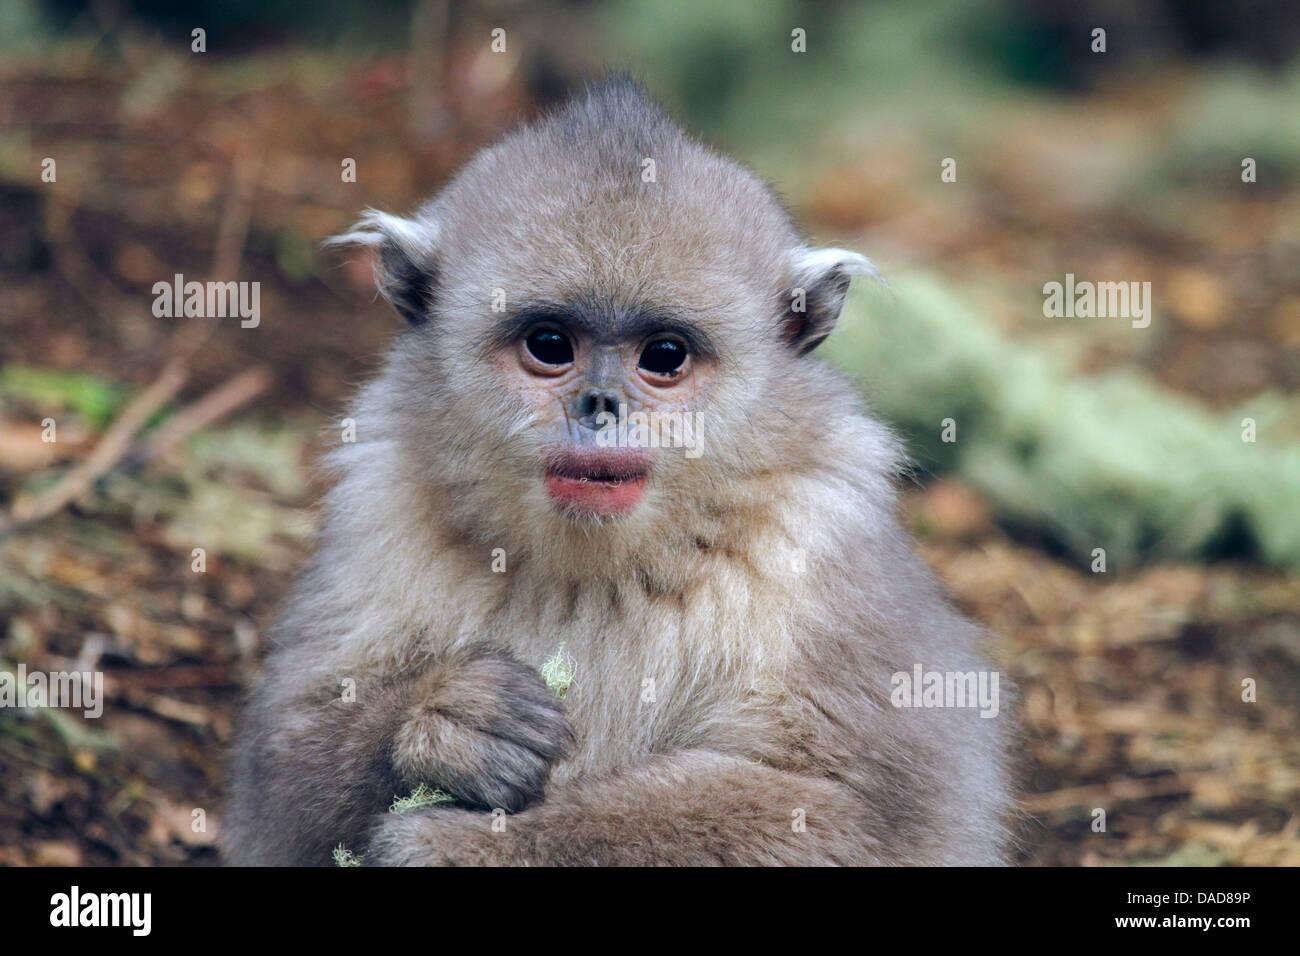 Black snub-nosed monkey, Yunnan snub-nosed monkey (Rhinopithecus bieti), juvenile eats lichen, China, Yunnan, Baima Stock Photo